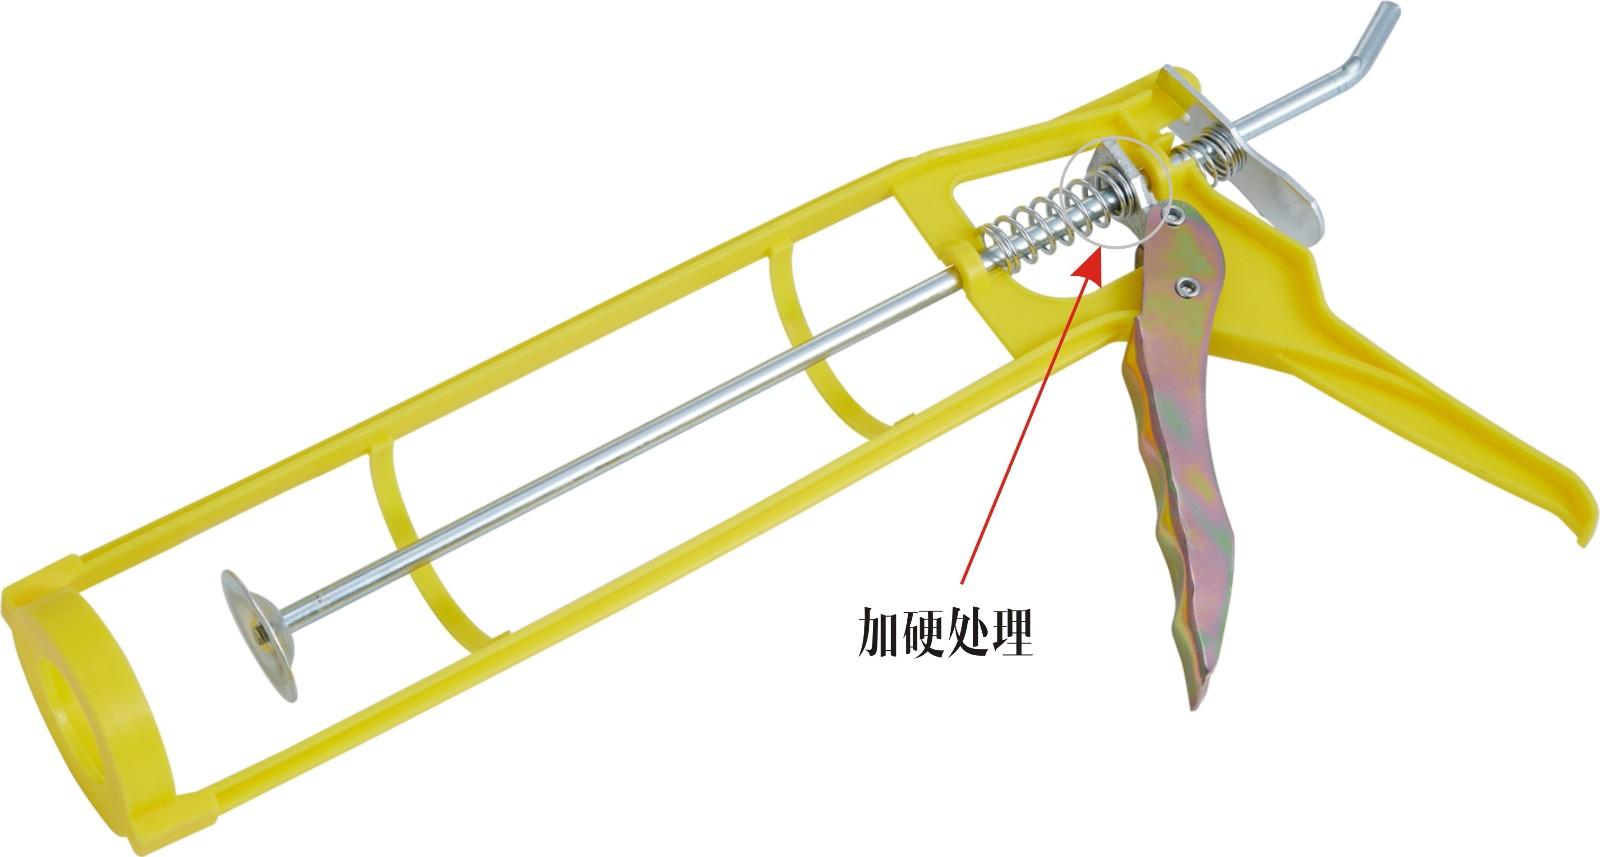 ZG-1611(塑料胶枪).jpg